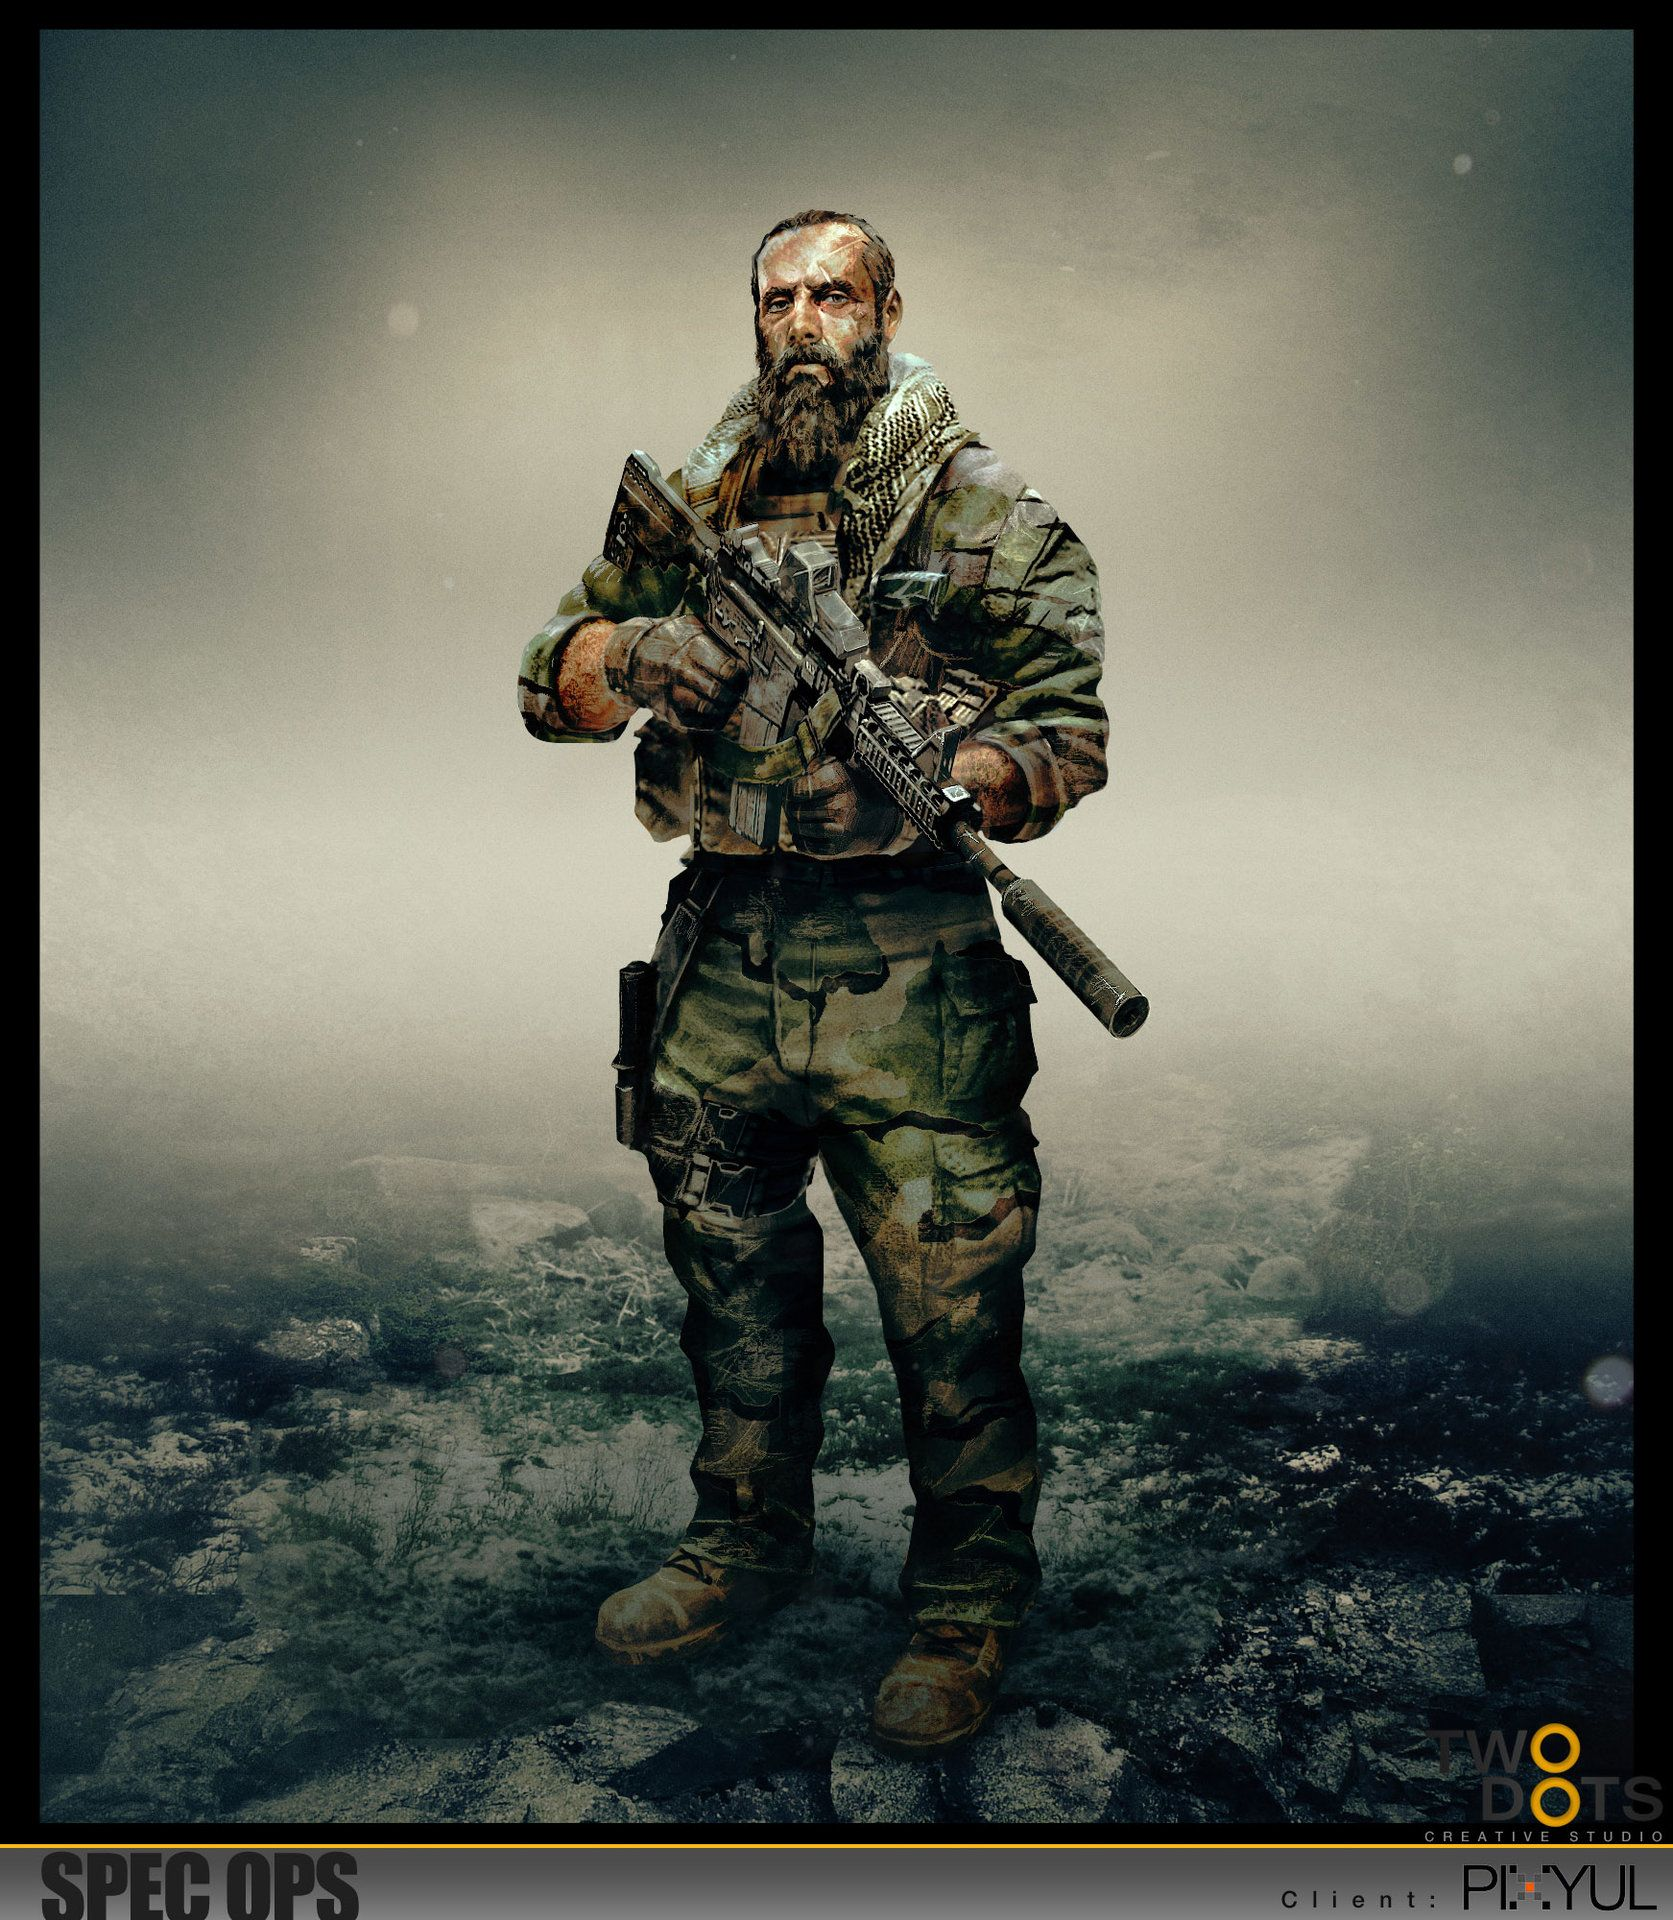 Apocalyptic Soldier Pics: ArtStation - REROLL, Xavier Thomas